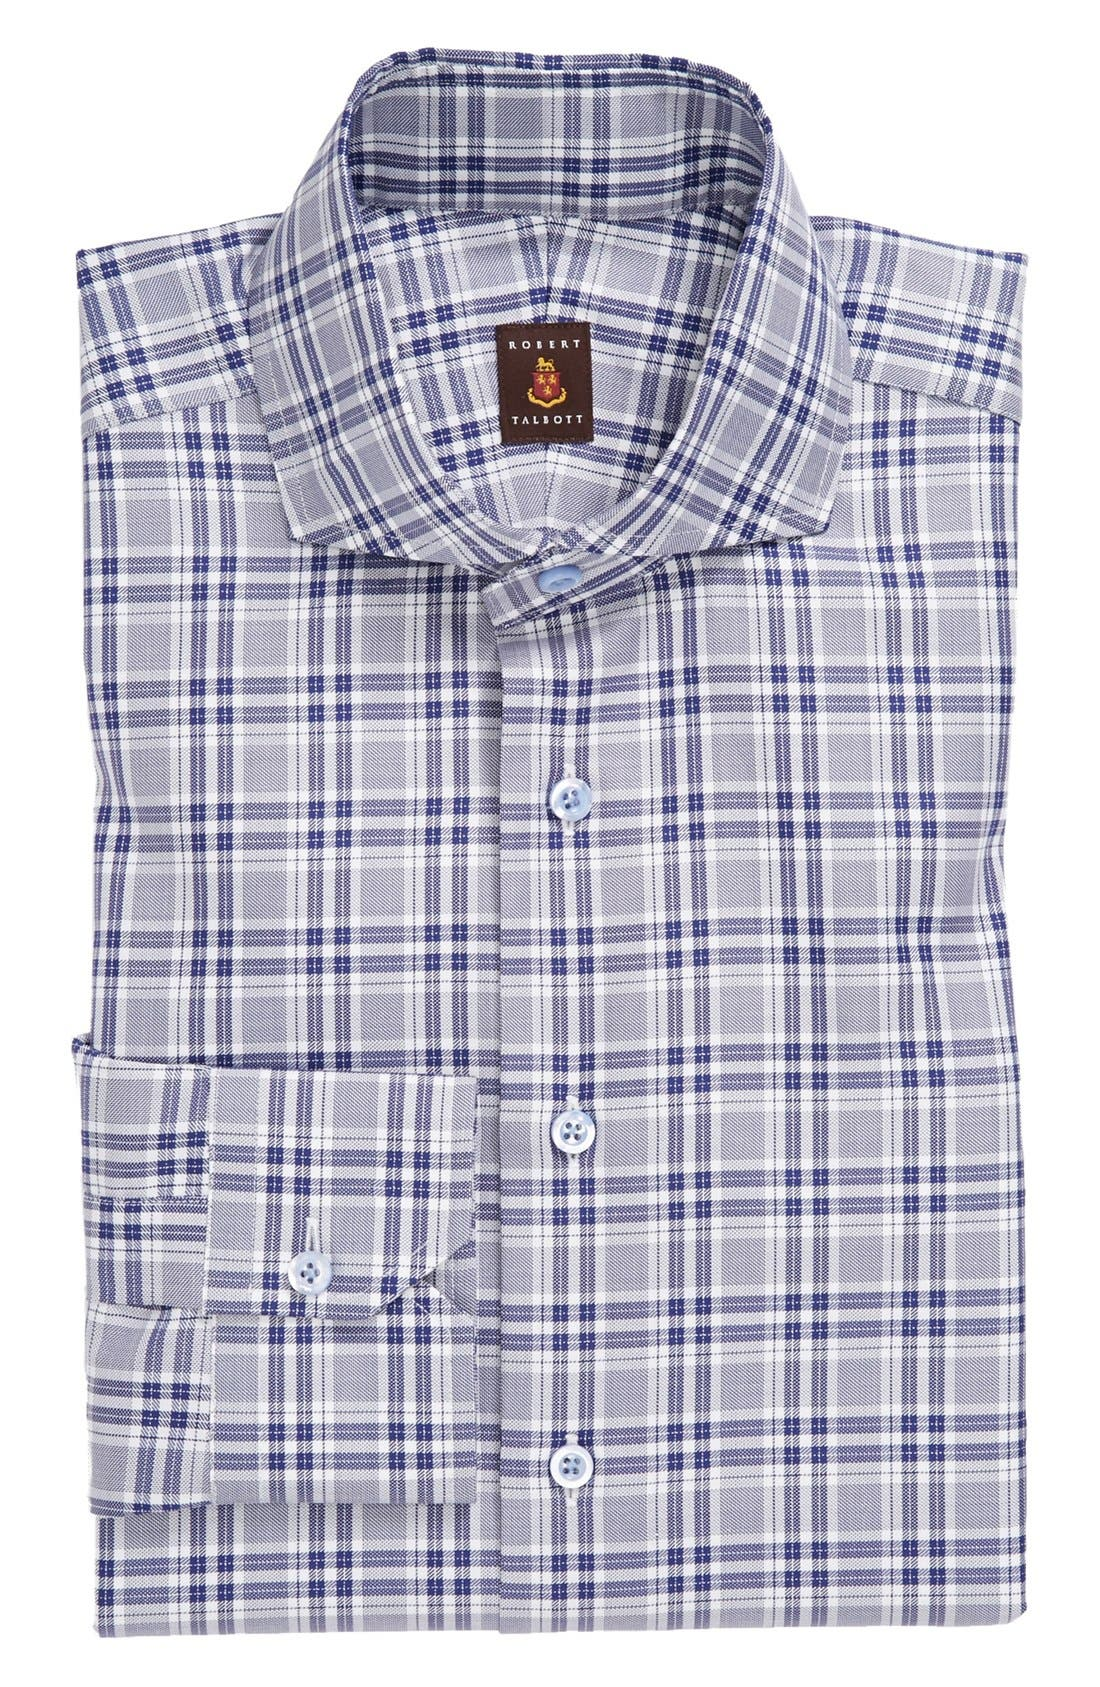 Main Image - Robert Talbott Classic Fit Dress Shirt